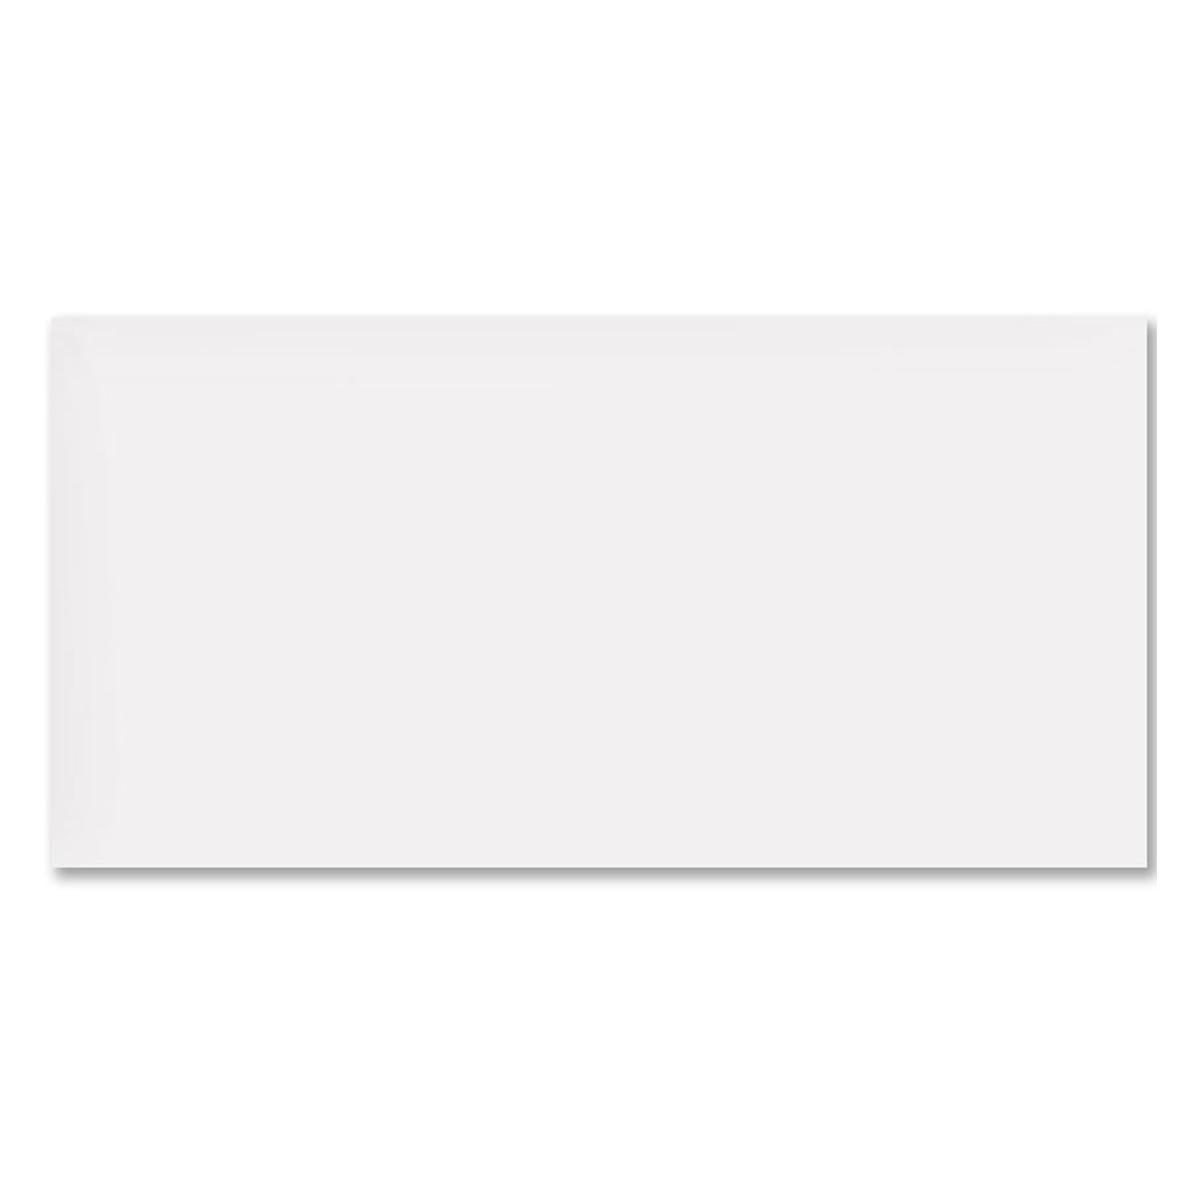 Gres Porcelánico Nieve Blanco Mate - 30X61 cm - 1.67 m2